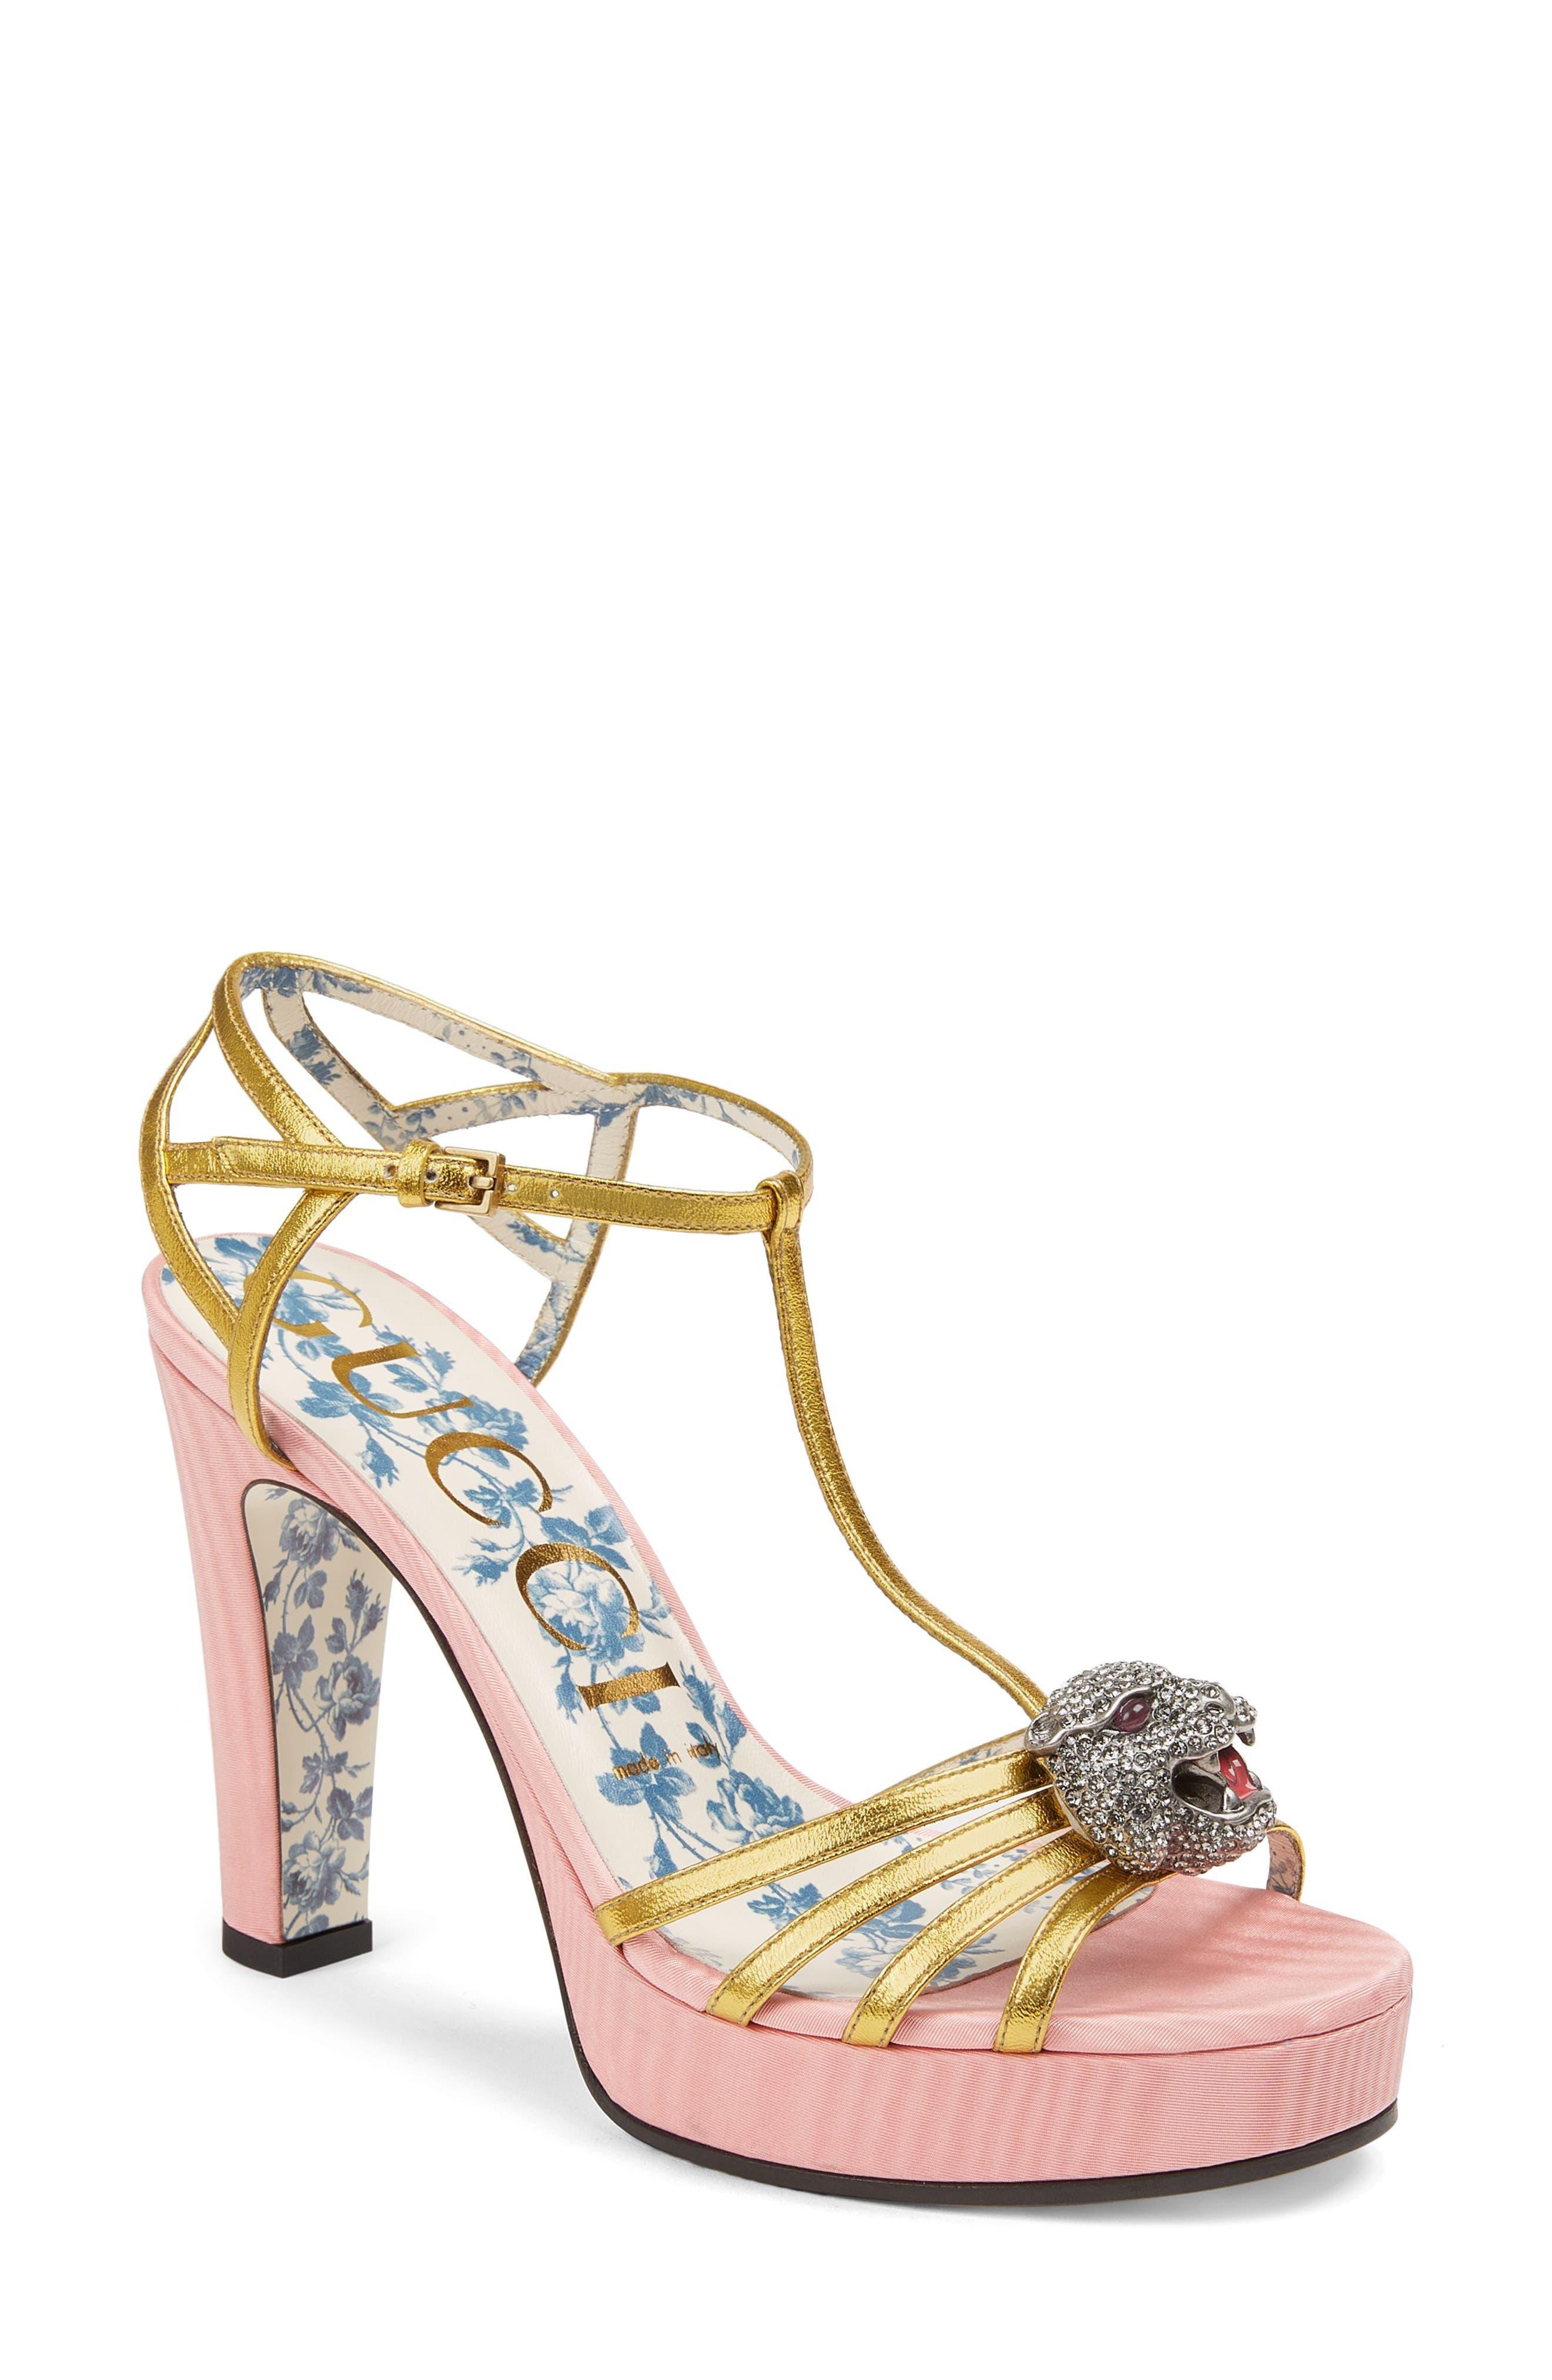 Alternate Image 1 Selected - Gucci Elias Crystal Tiger T-Strap Sandal (Women)